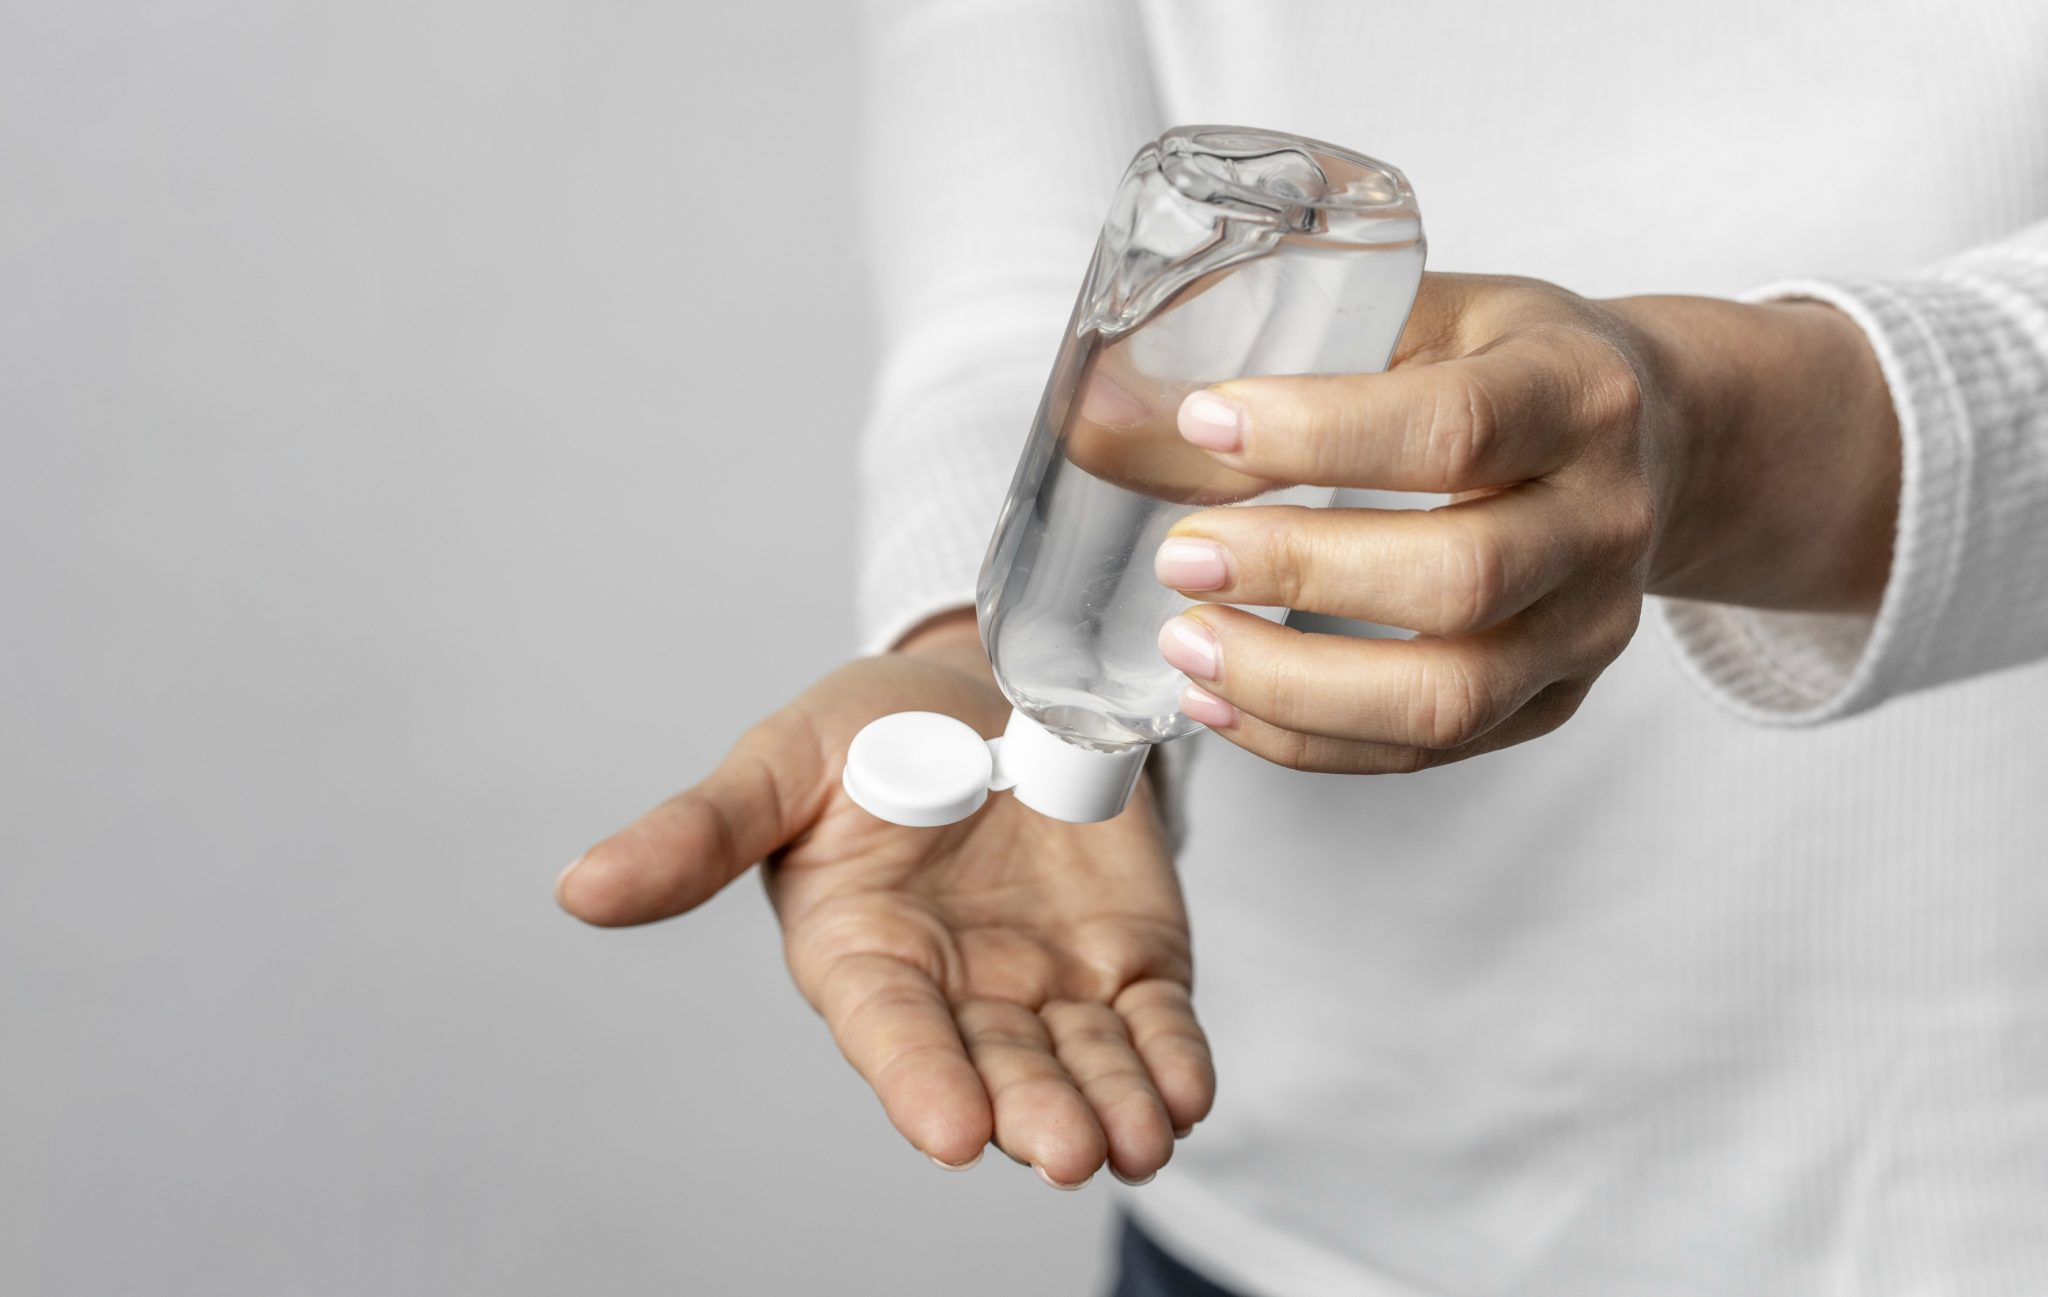 Subvisa interdita lotes de álcool em gel